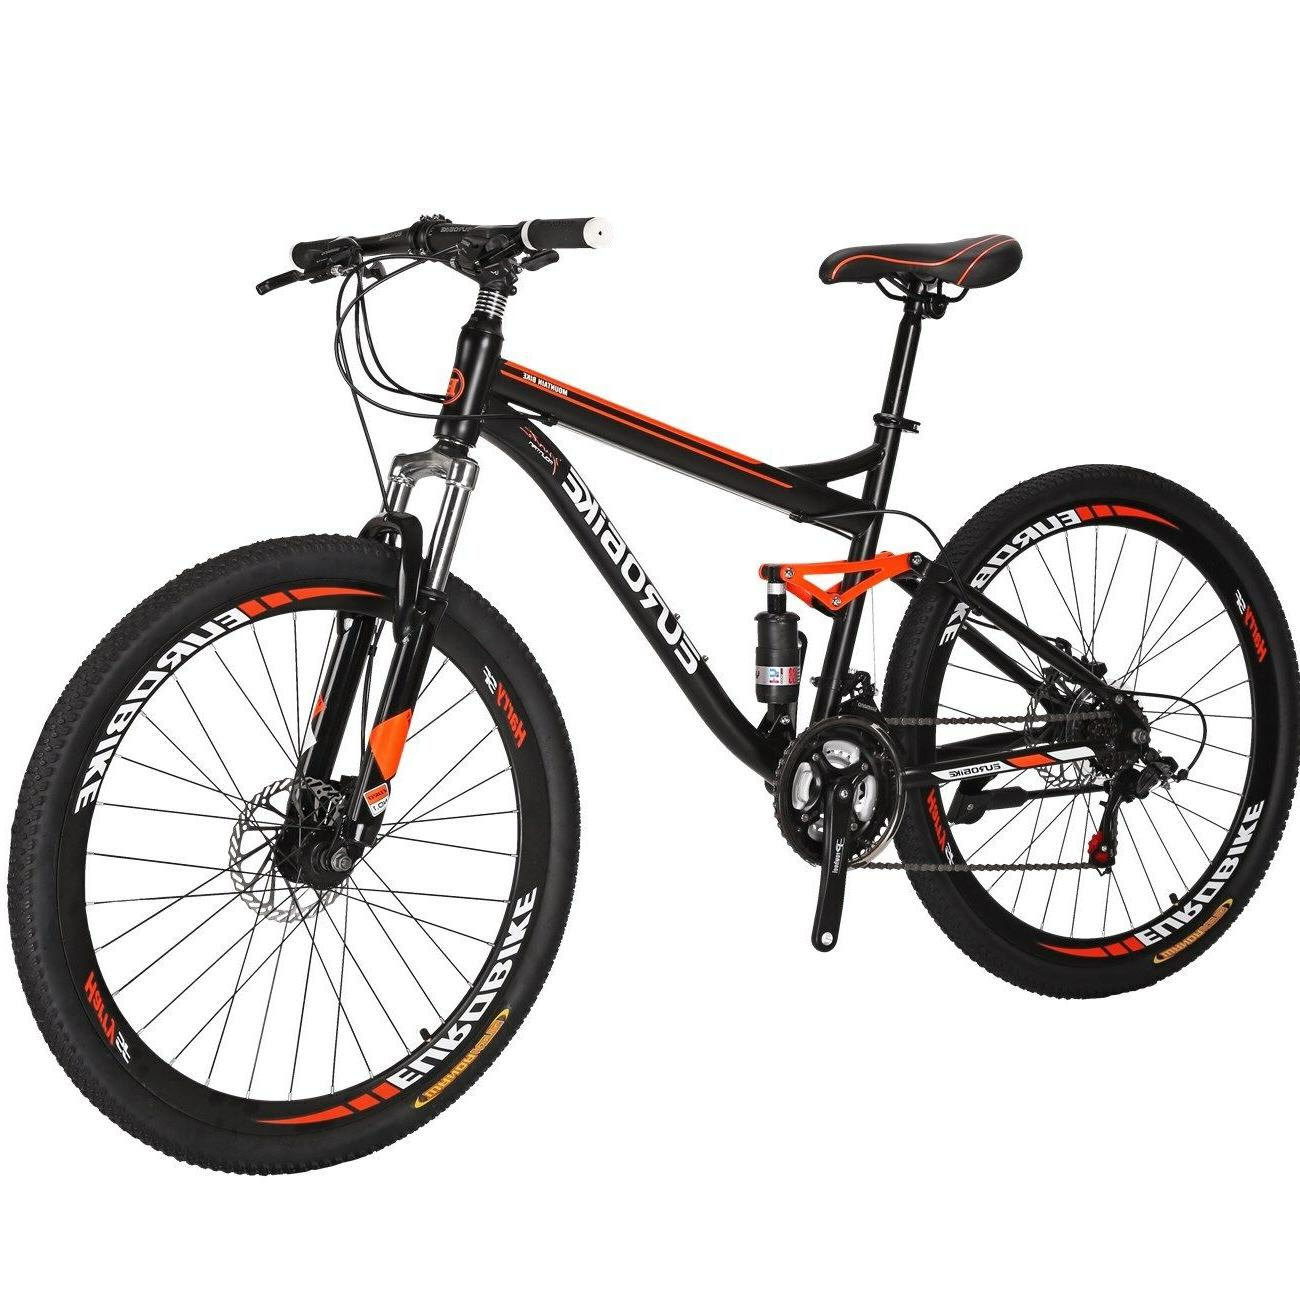 "27.5"" Suspension Bike Shimano 21 Mens Bicycle Disc MTB"